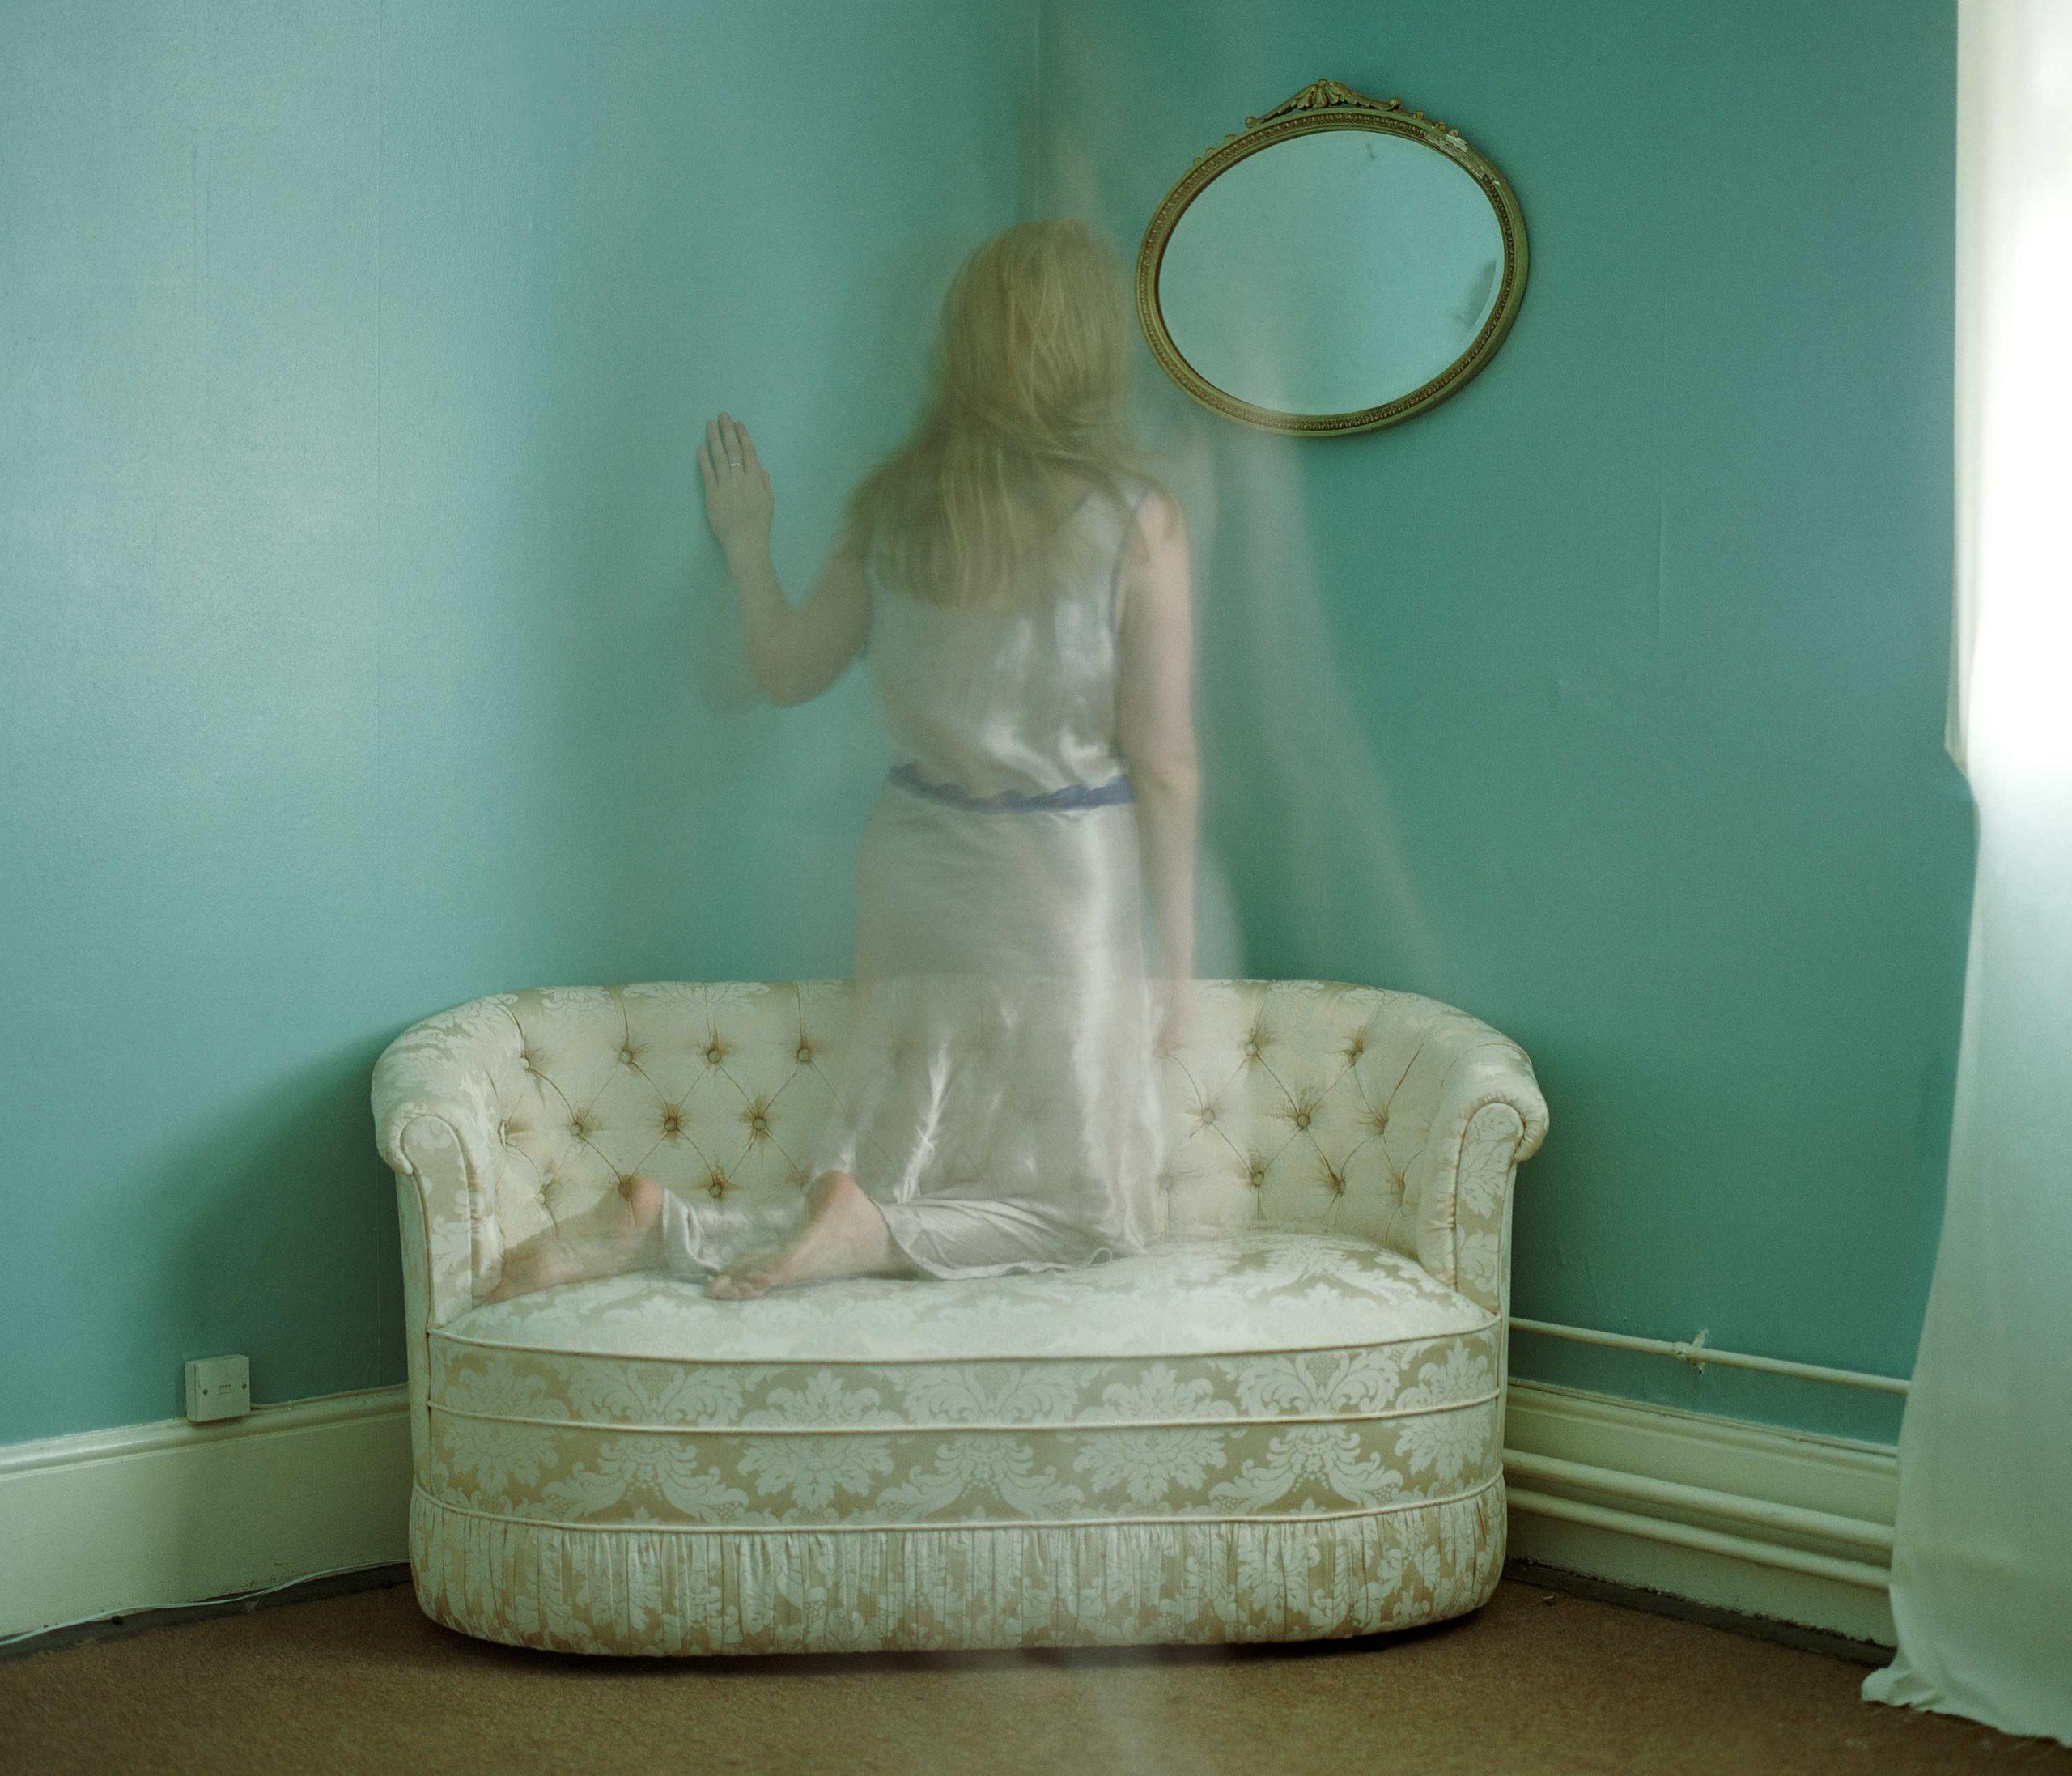 Wren-Agency-Rachel-Louise-Brown-Self As Other - 06